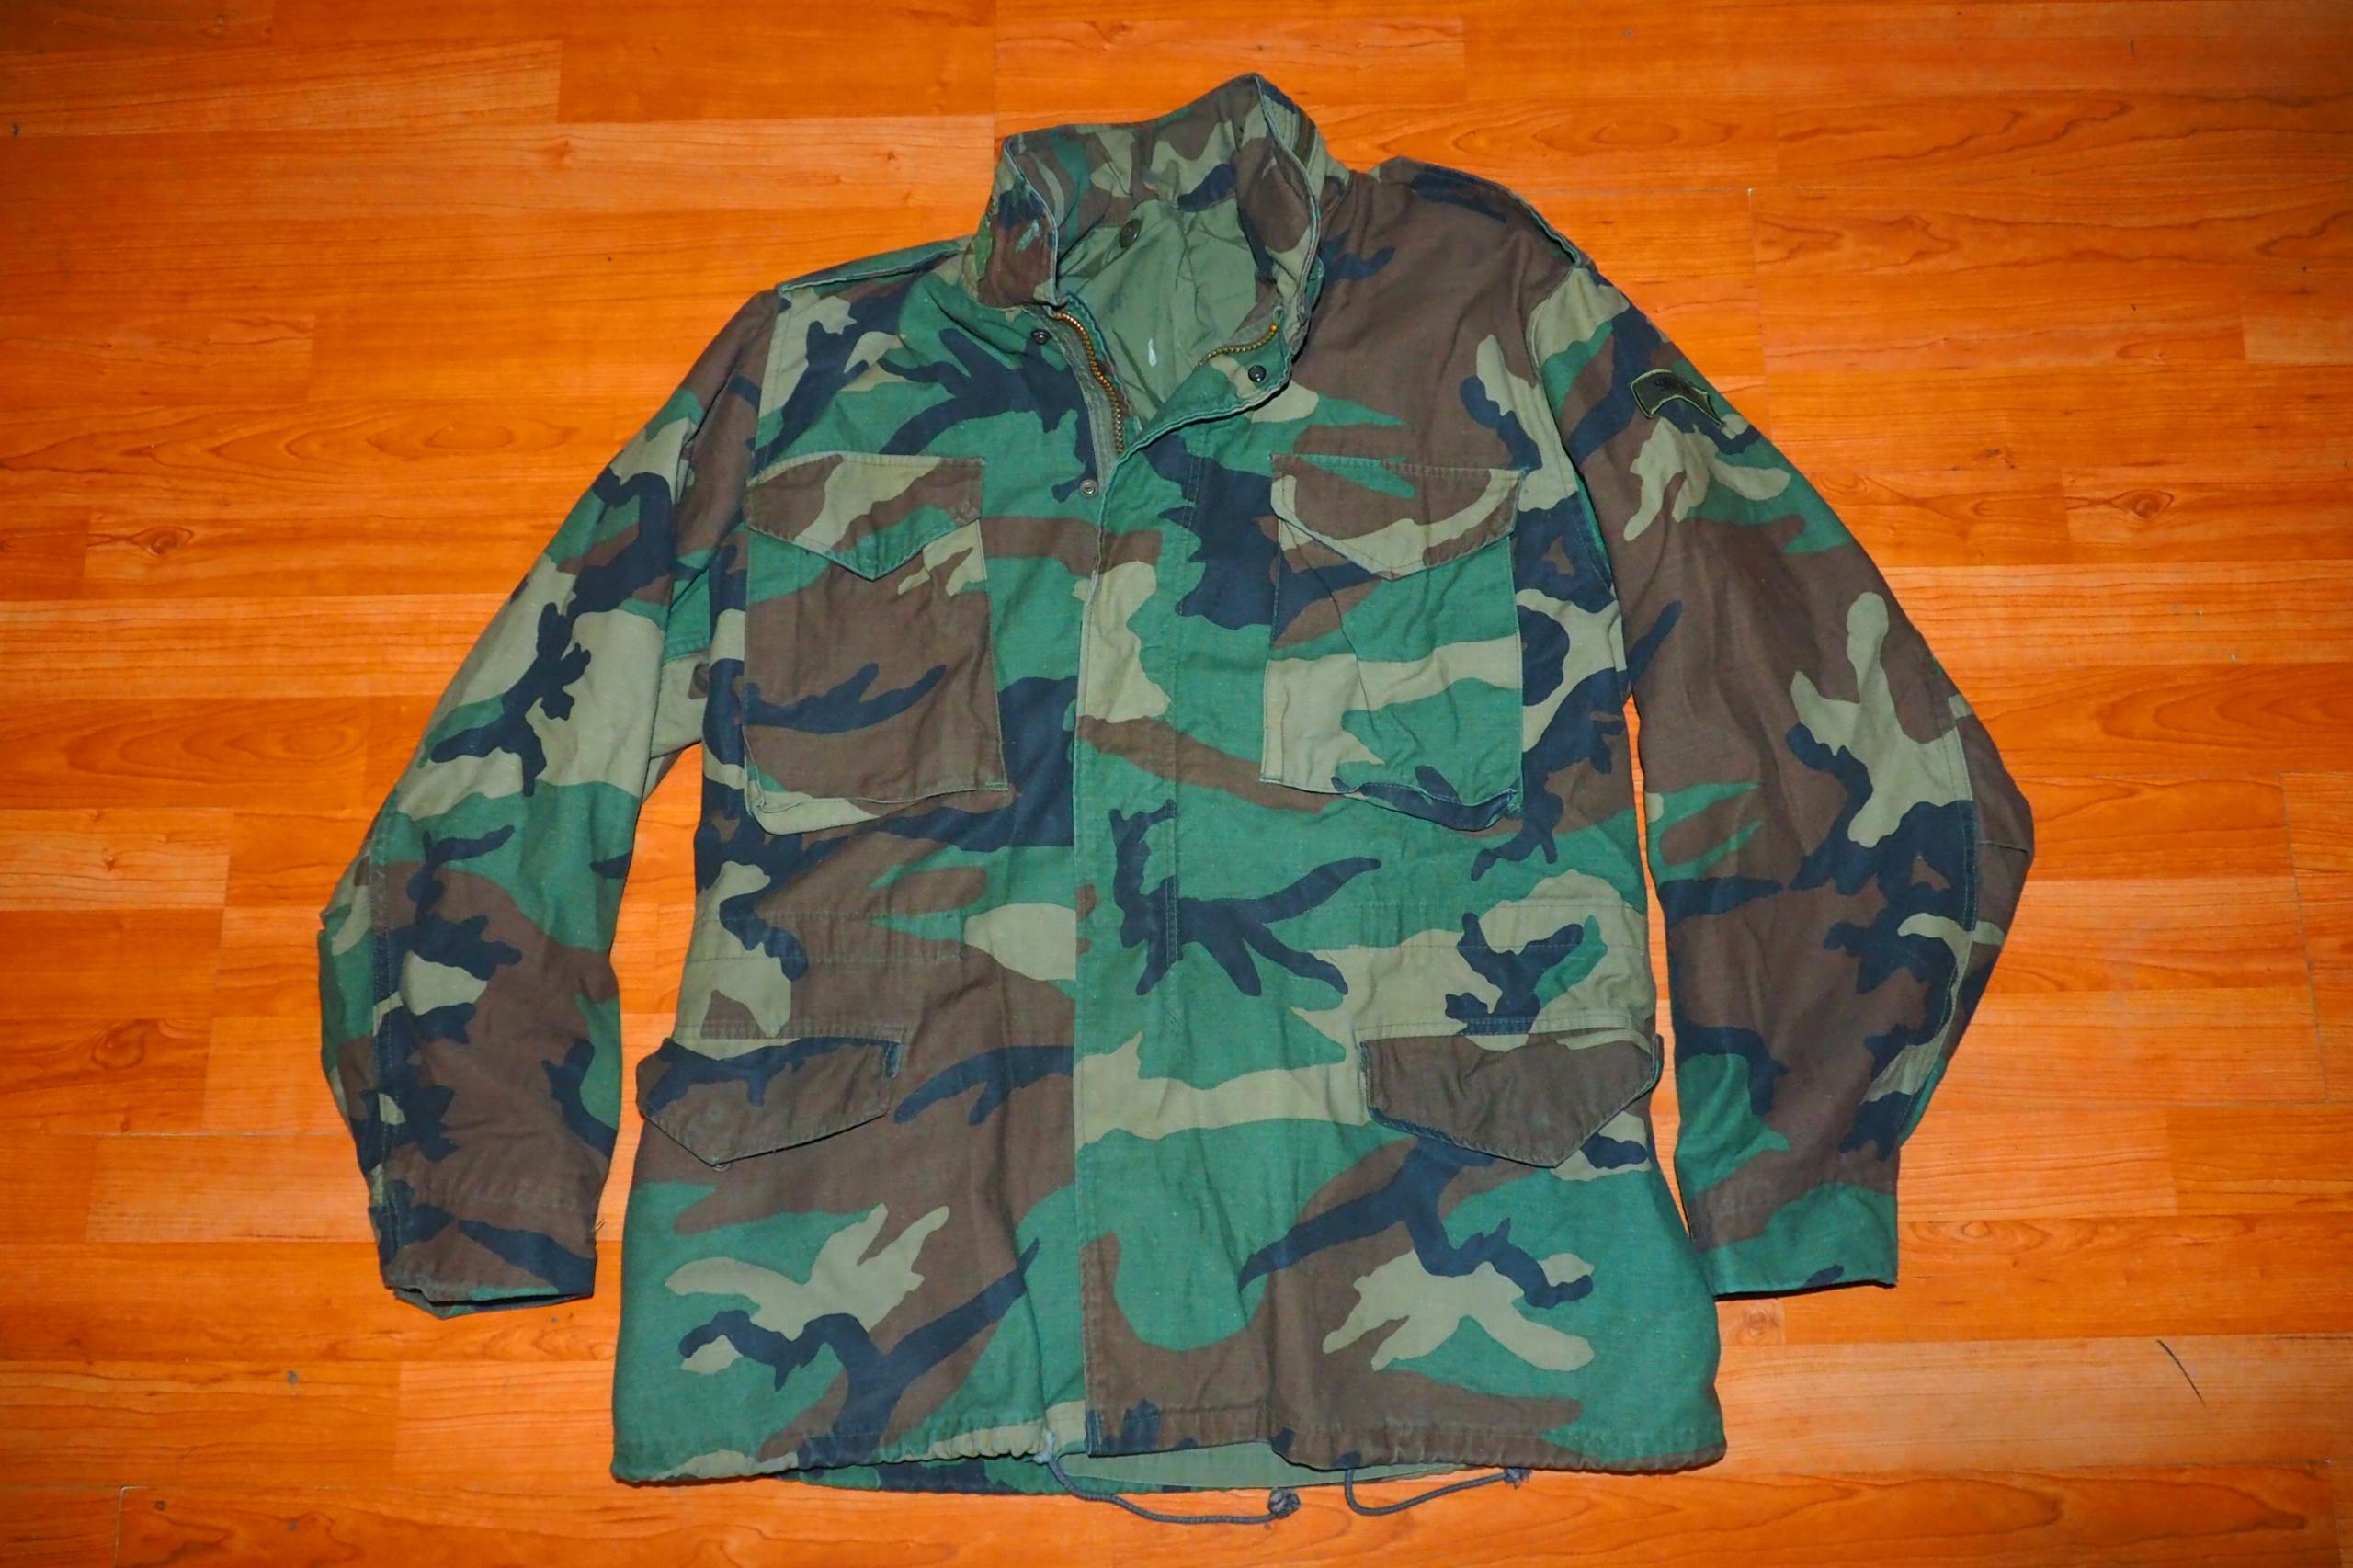 Oryginalna kurtka wojskowa M65 (175cm)